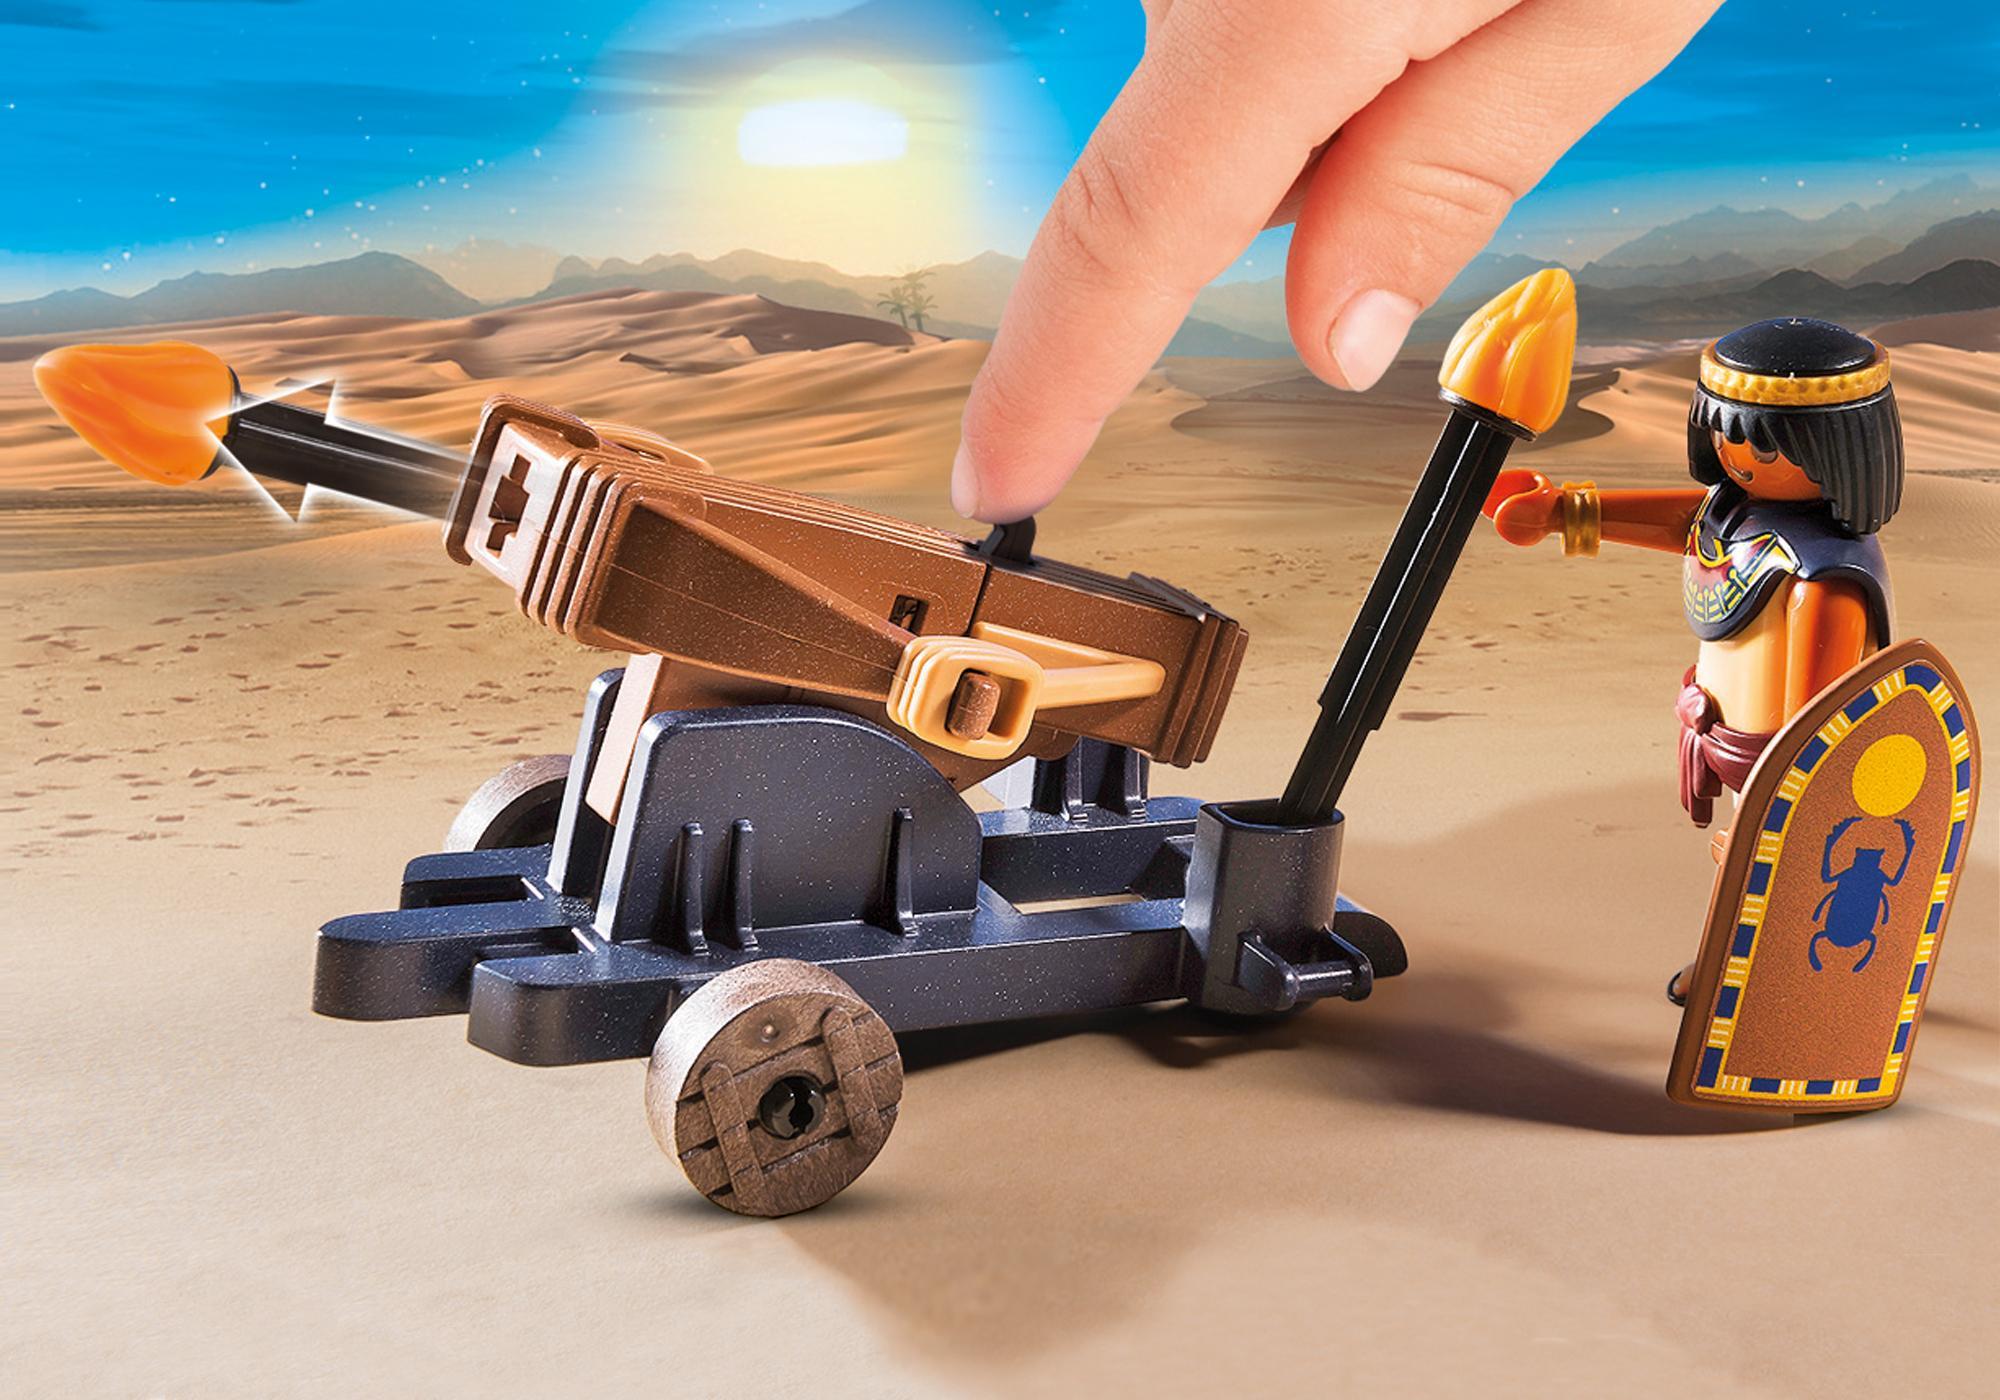 http://media.playmobil.com/i/playmobil/5388_product_extra1/Egyptian Troop with Ballista